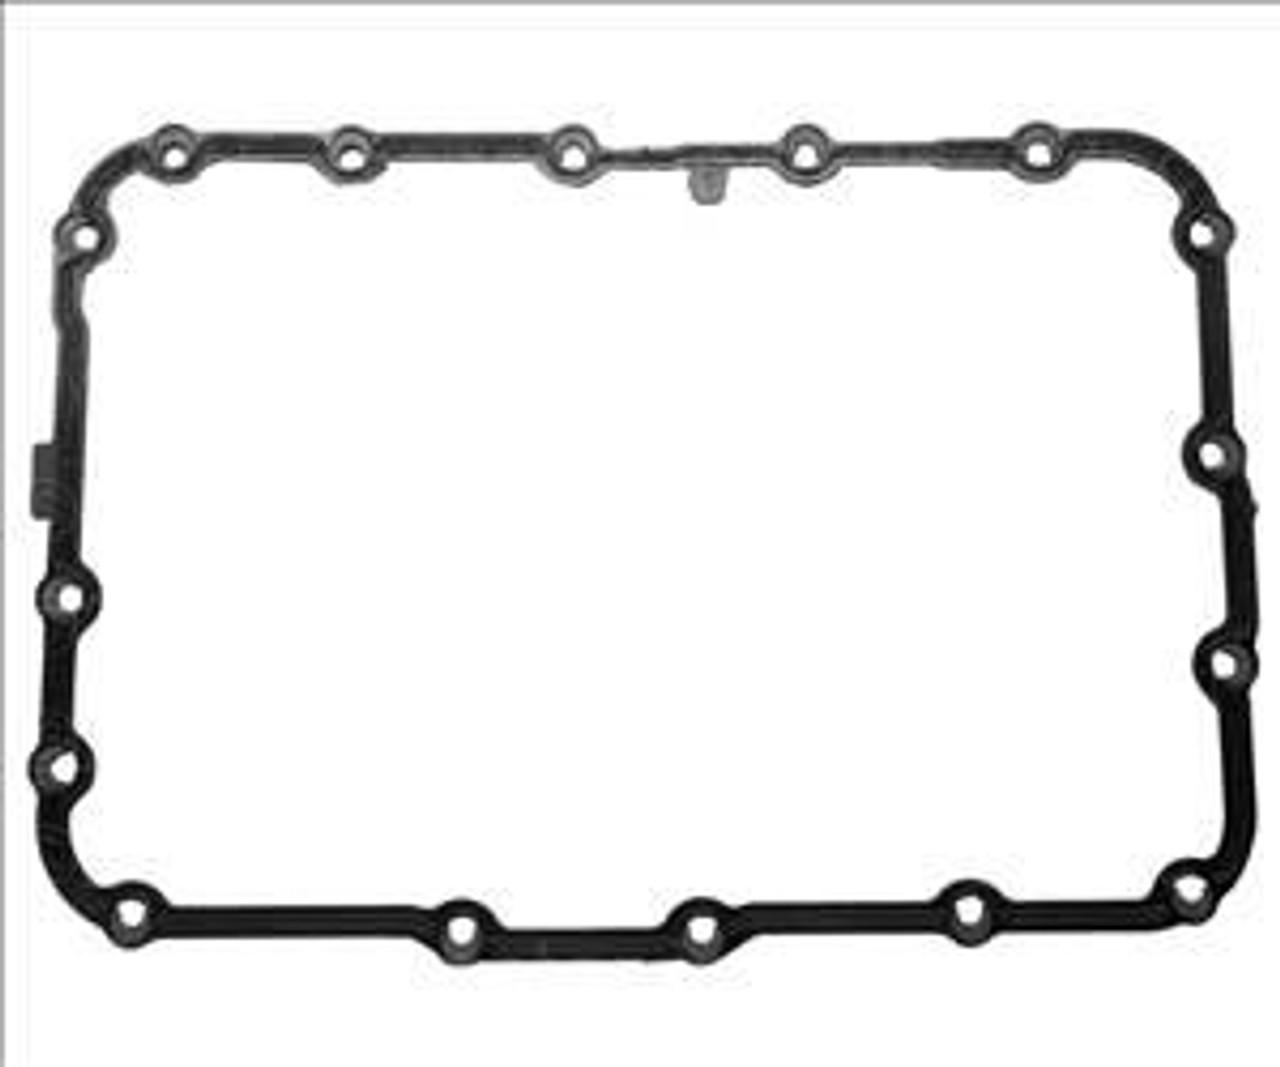 5R55N 5R55S 5R55W TRANSMISSION MOLDED RUBBER PAN GASKET